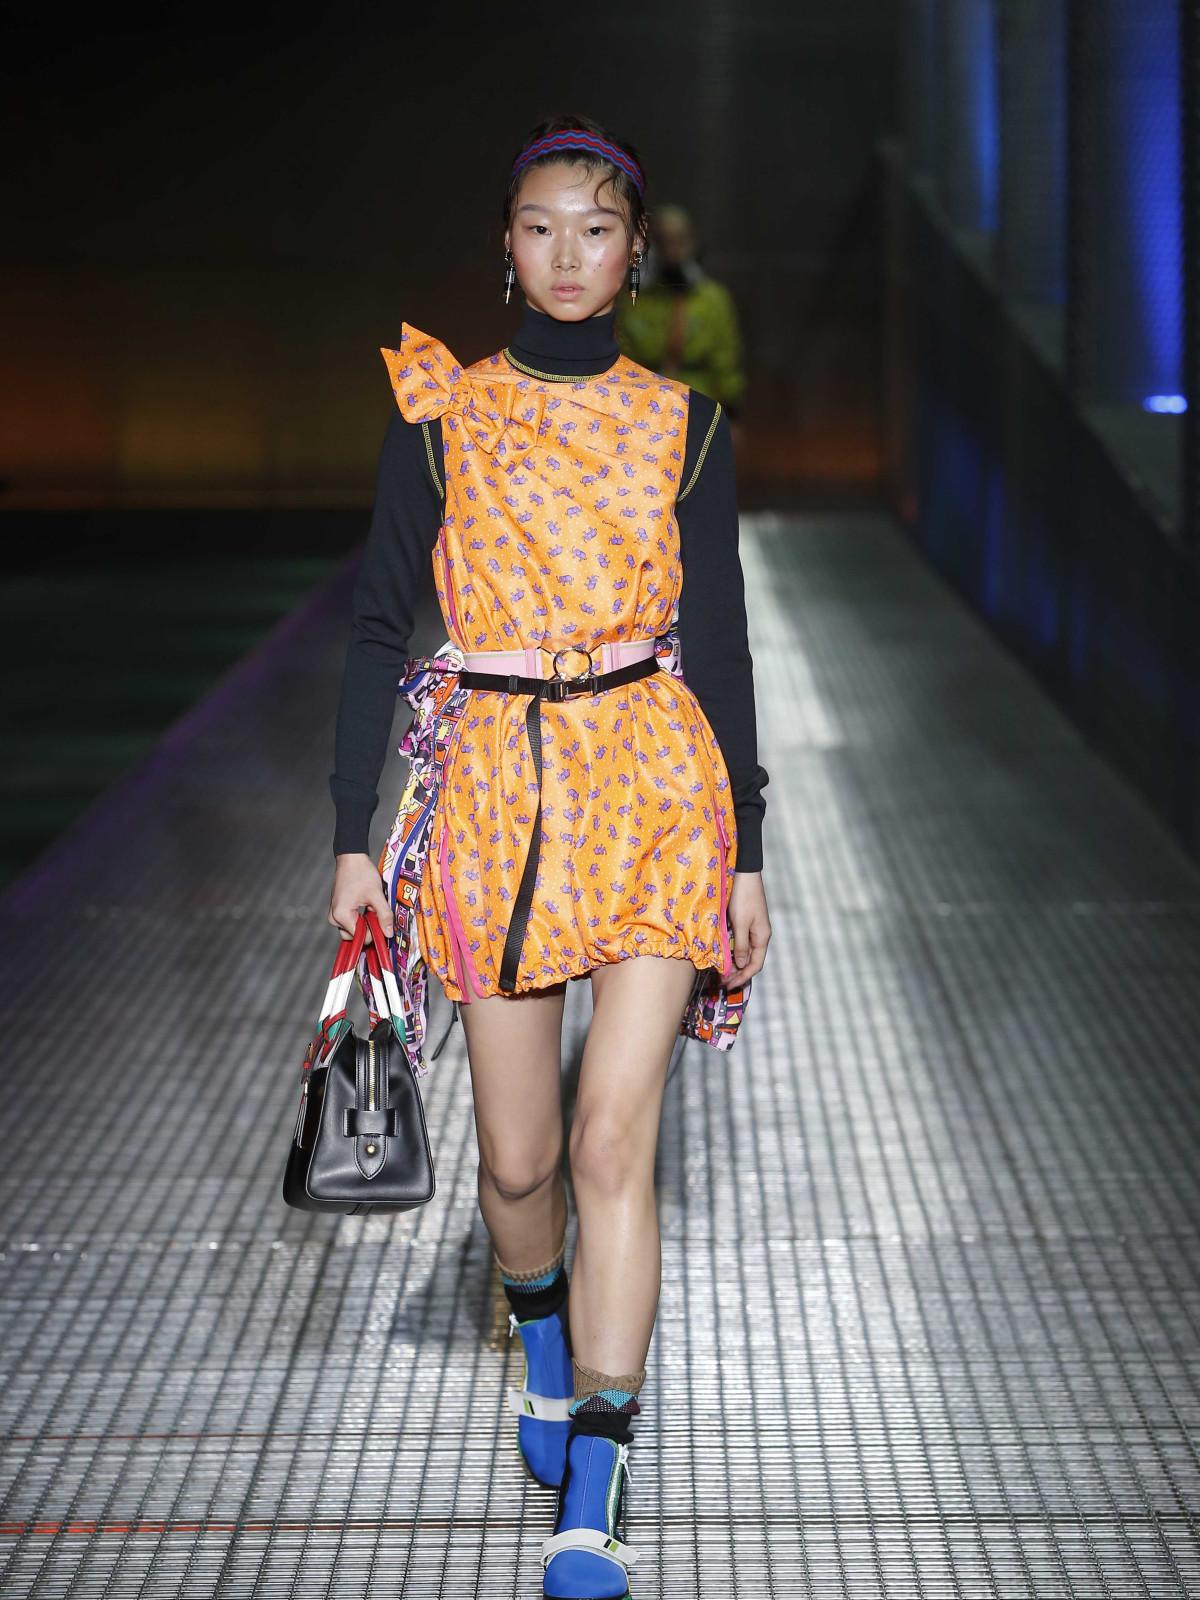 Prada menswear spring 2017 women's look